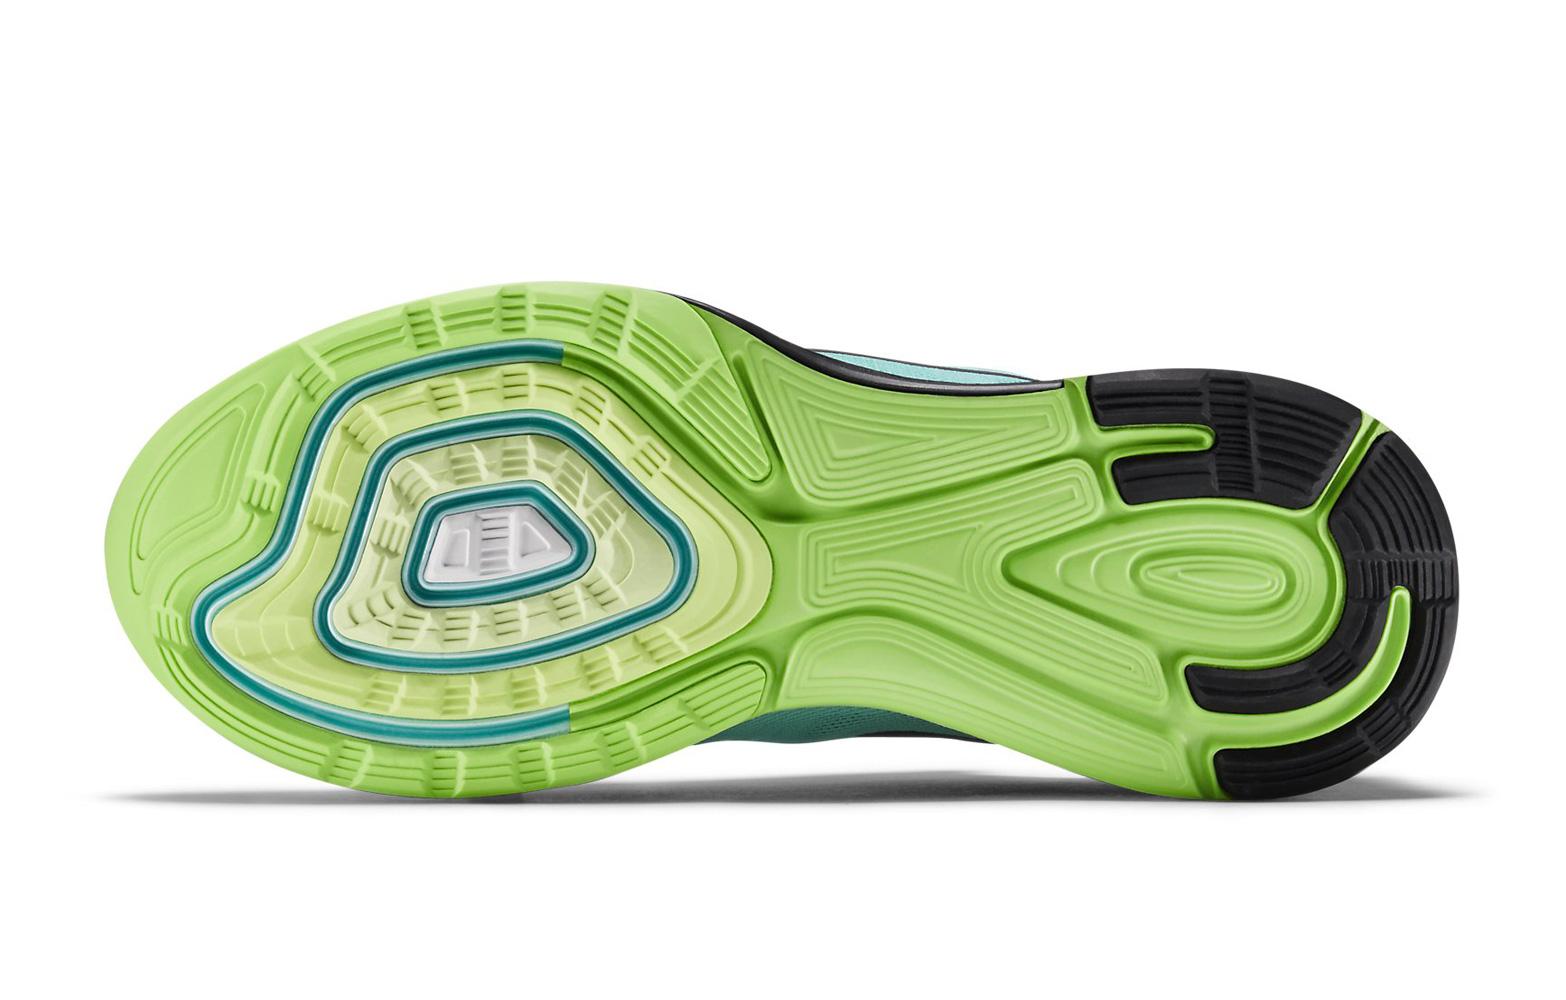 Nike Lunarglide 6 Azul Y Verde NEC5HU